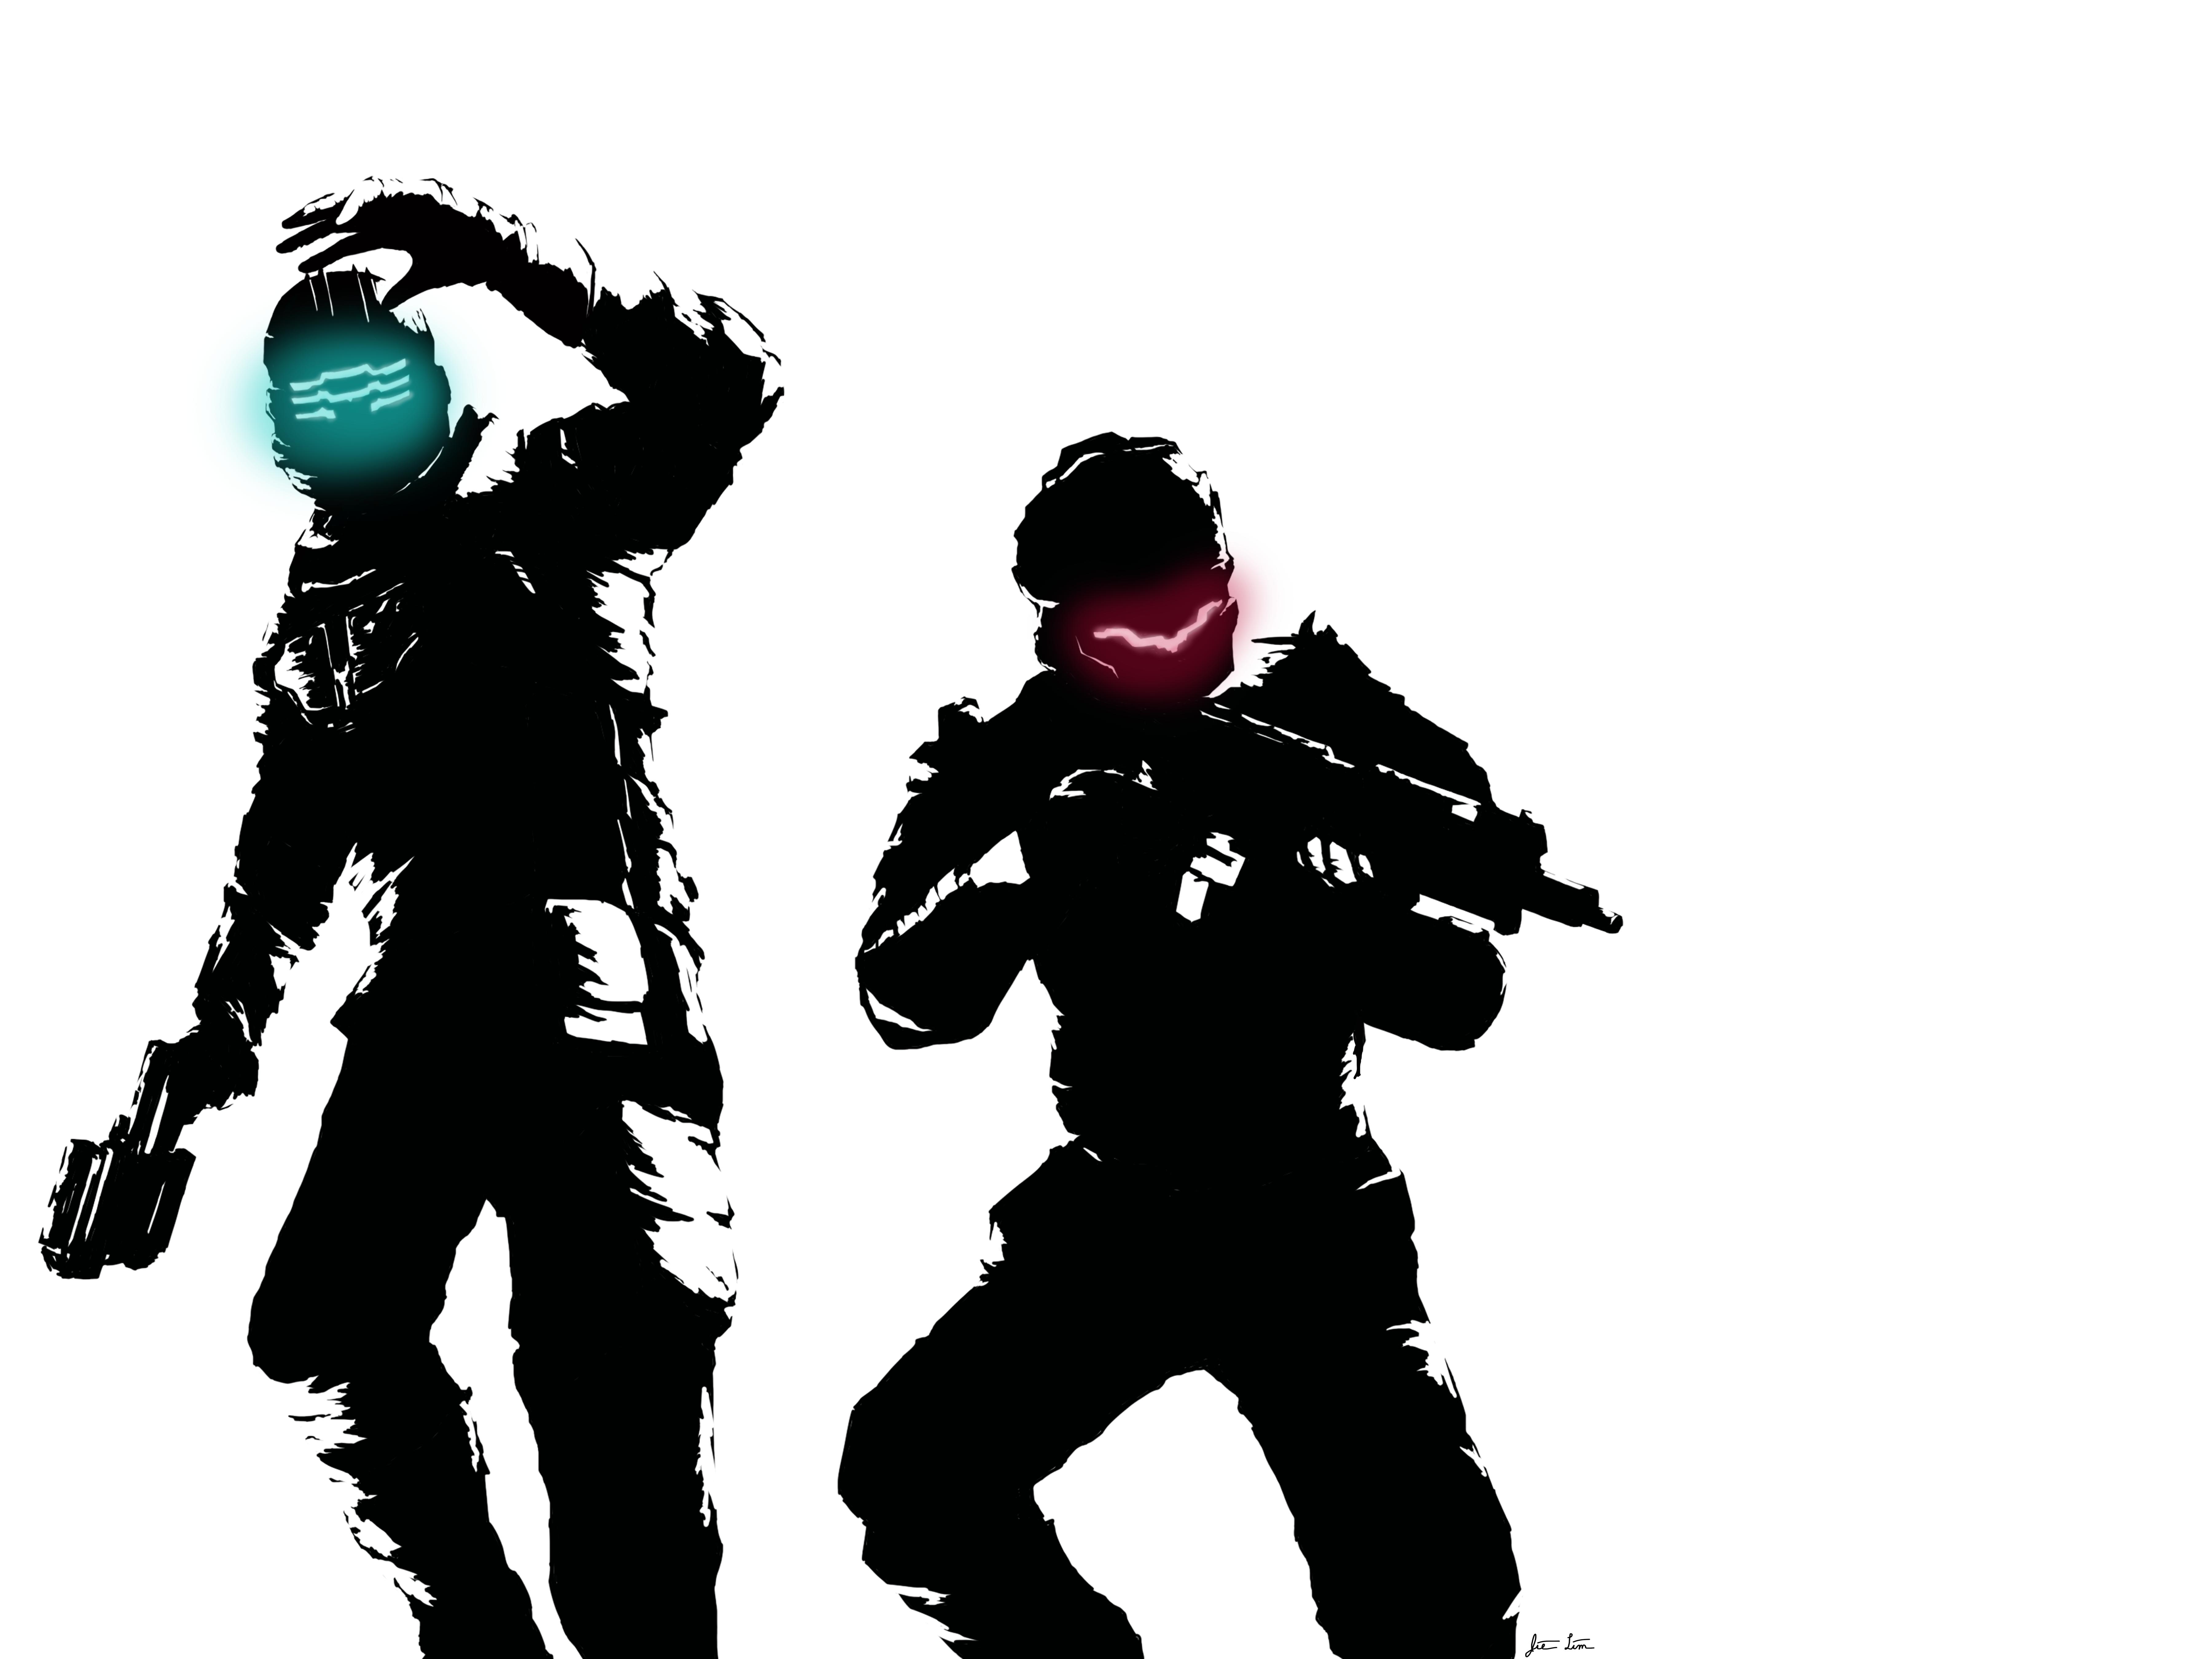 Dead Space 3 Wallpaper V1 by AsphaltEvidence on DeviantArt